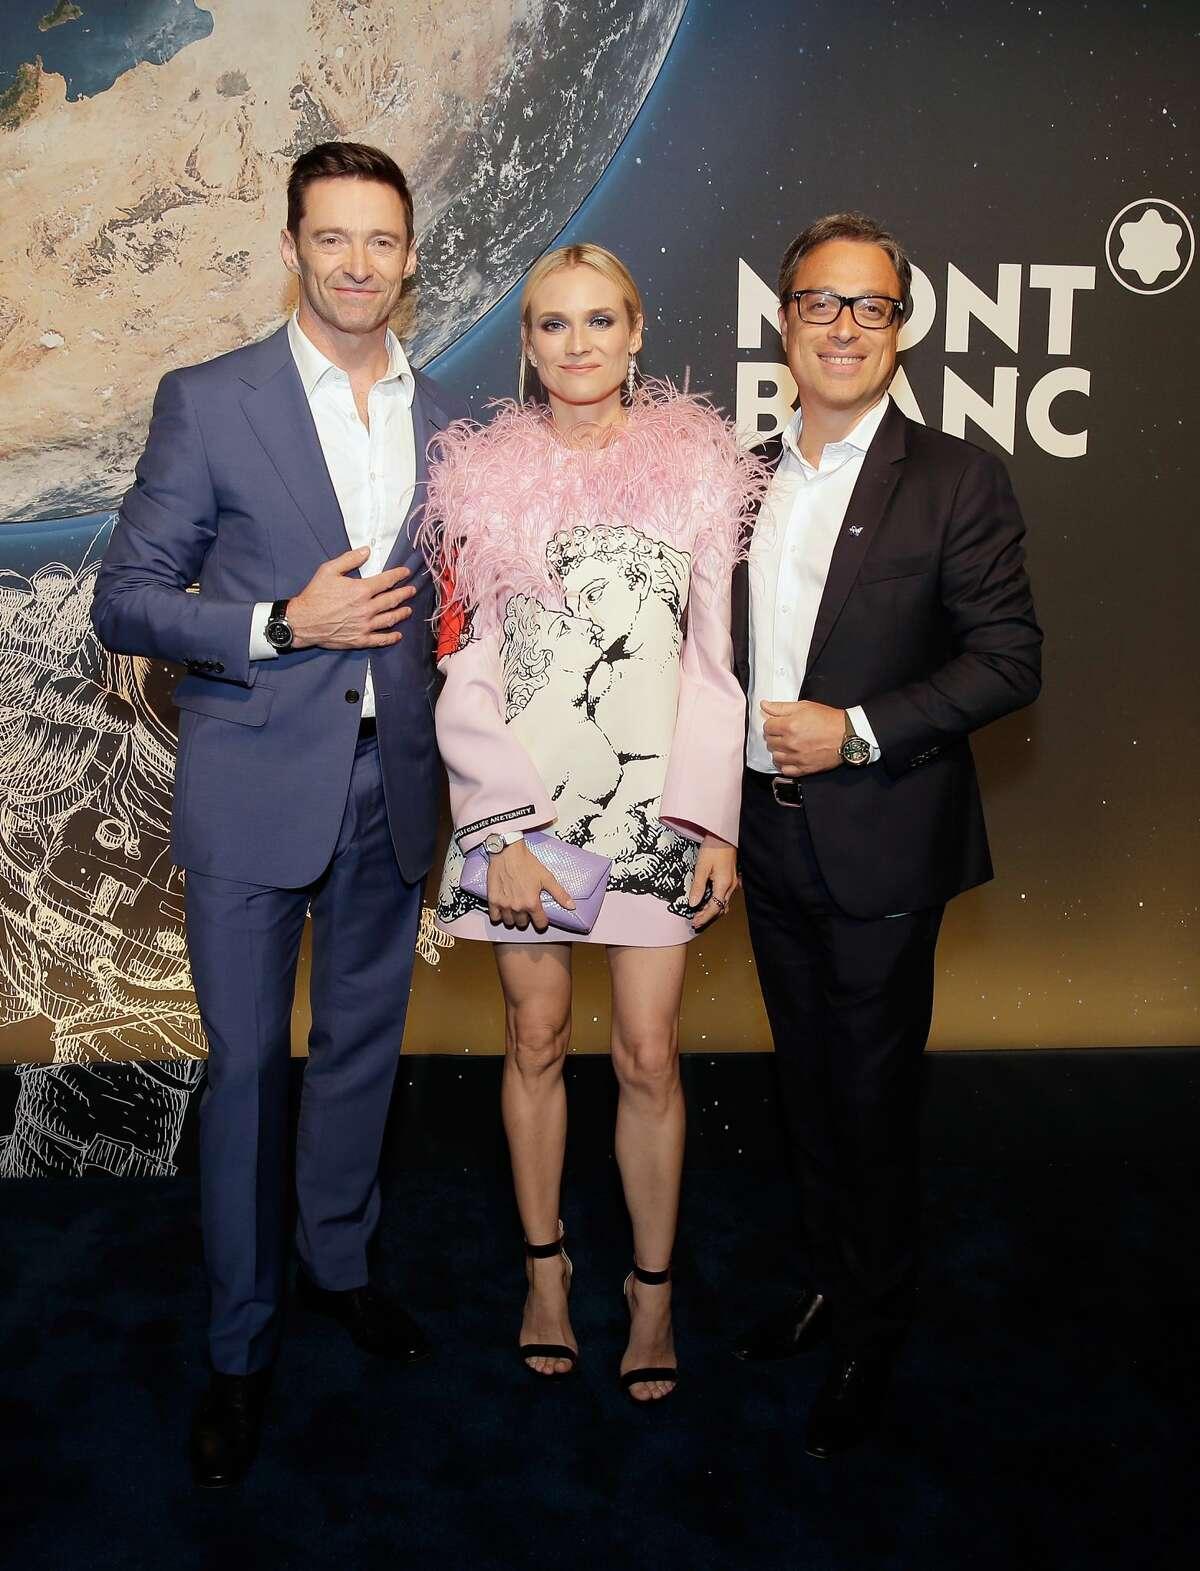 Hugh Jackman, Diane Kruger, Montblanc executive CEO Nicolas Baretzki